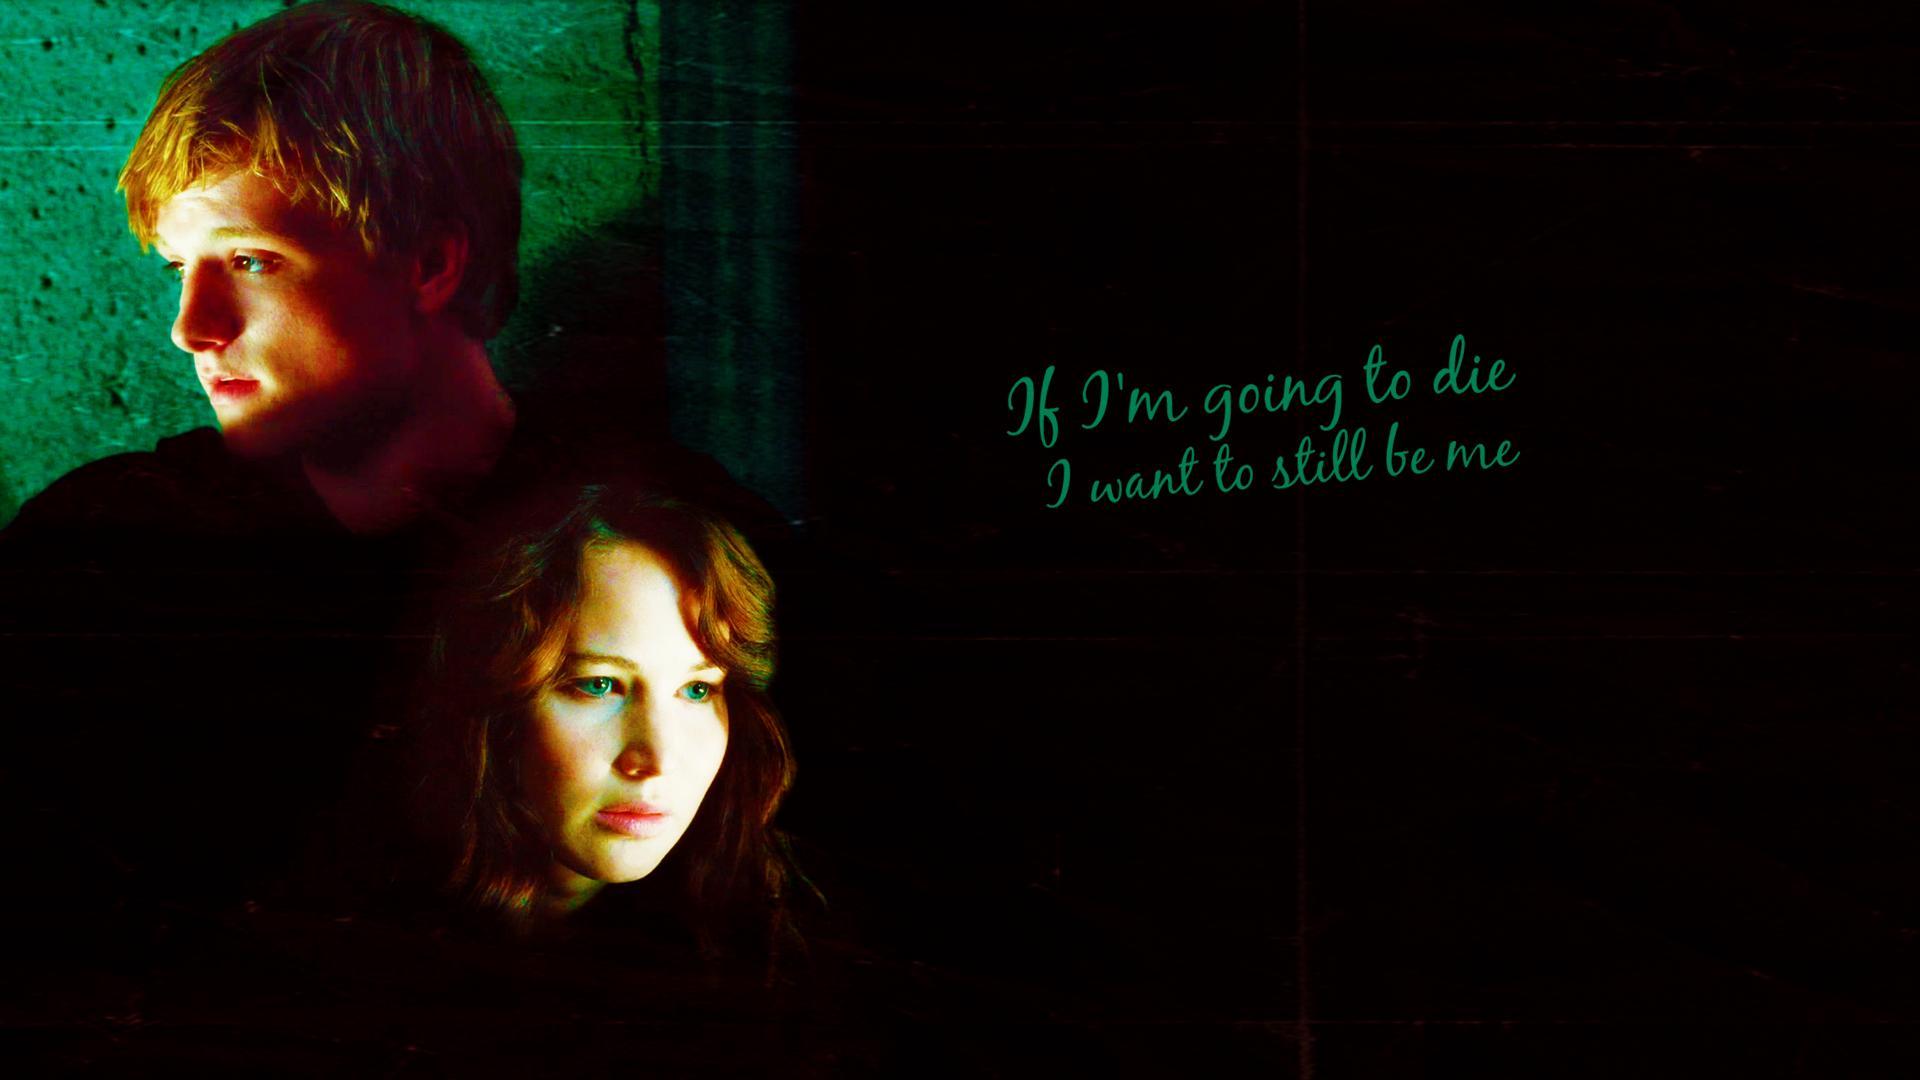 Peeta and Katniss Everdeen